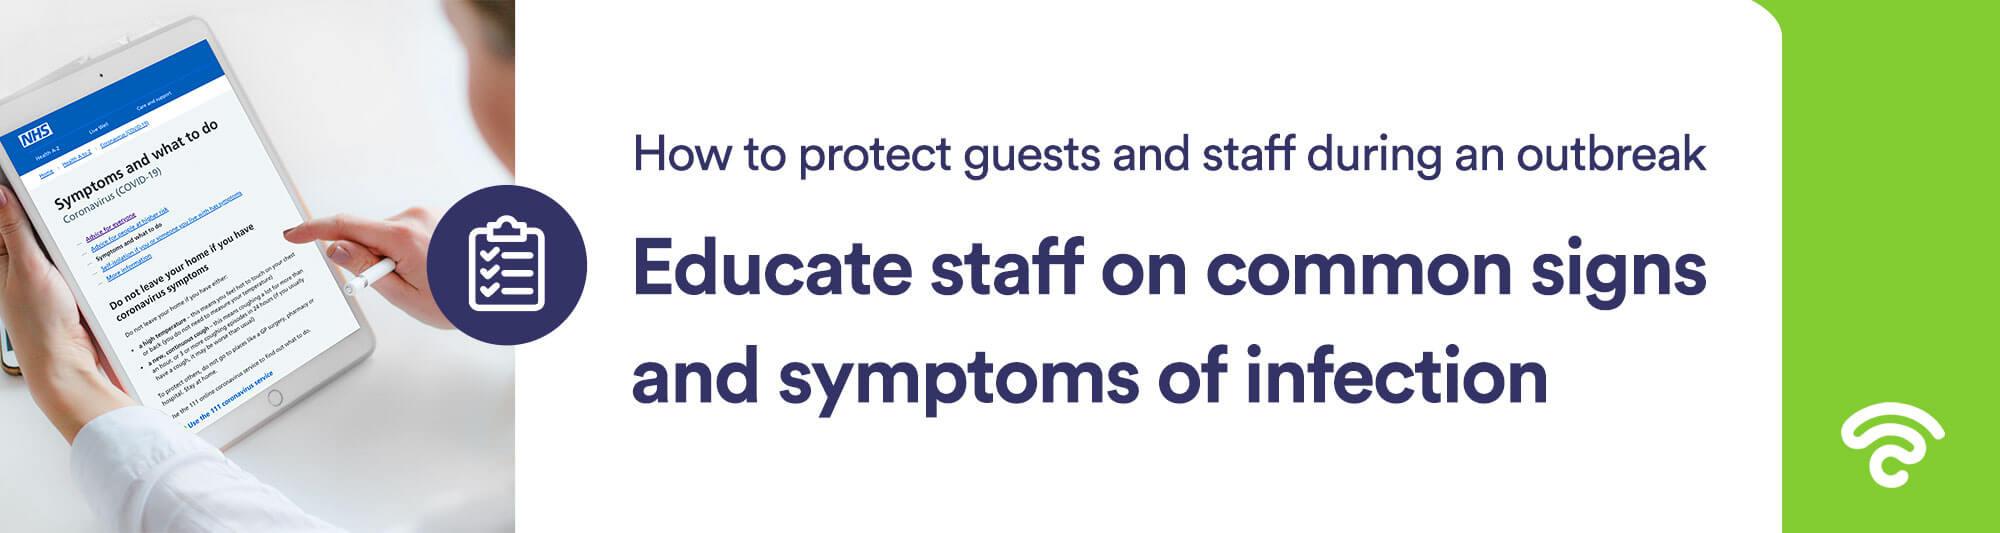 hotel coronavirus education